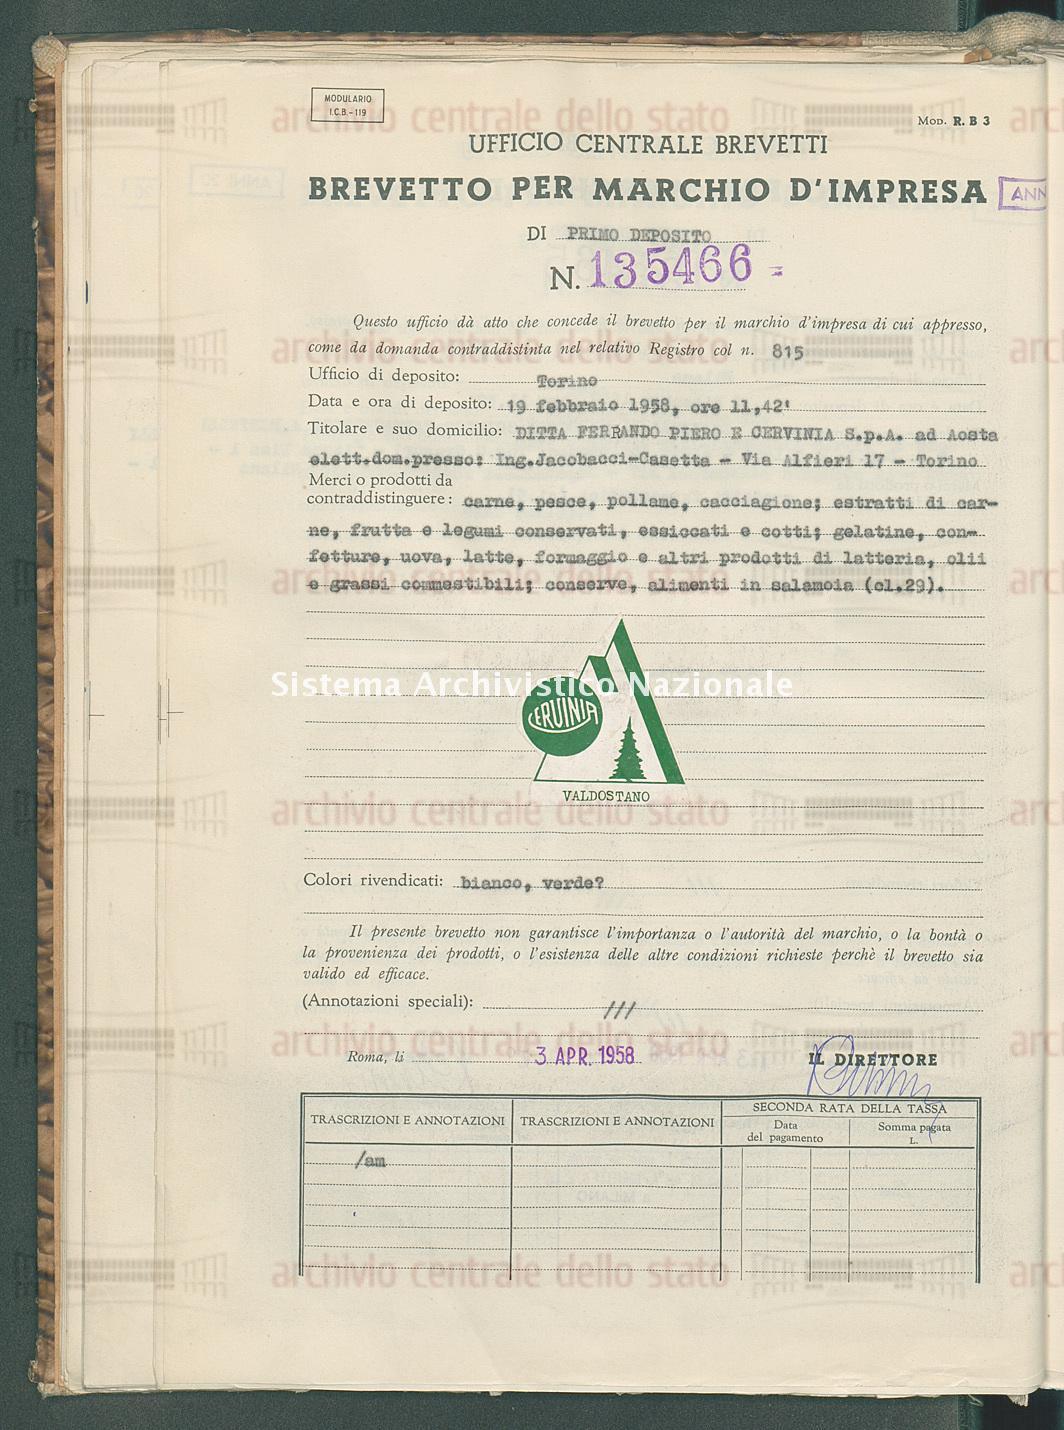 Carne , pesce, pollame ecc. Ditta Ferrando Piero E Cervinia S.P.A. (03/04/1958)